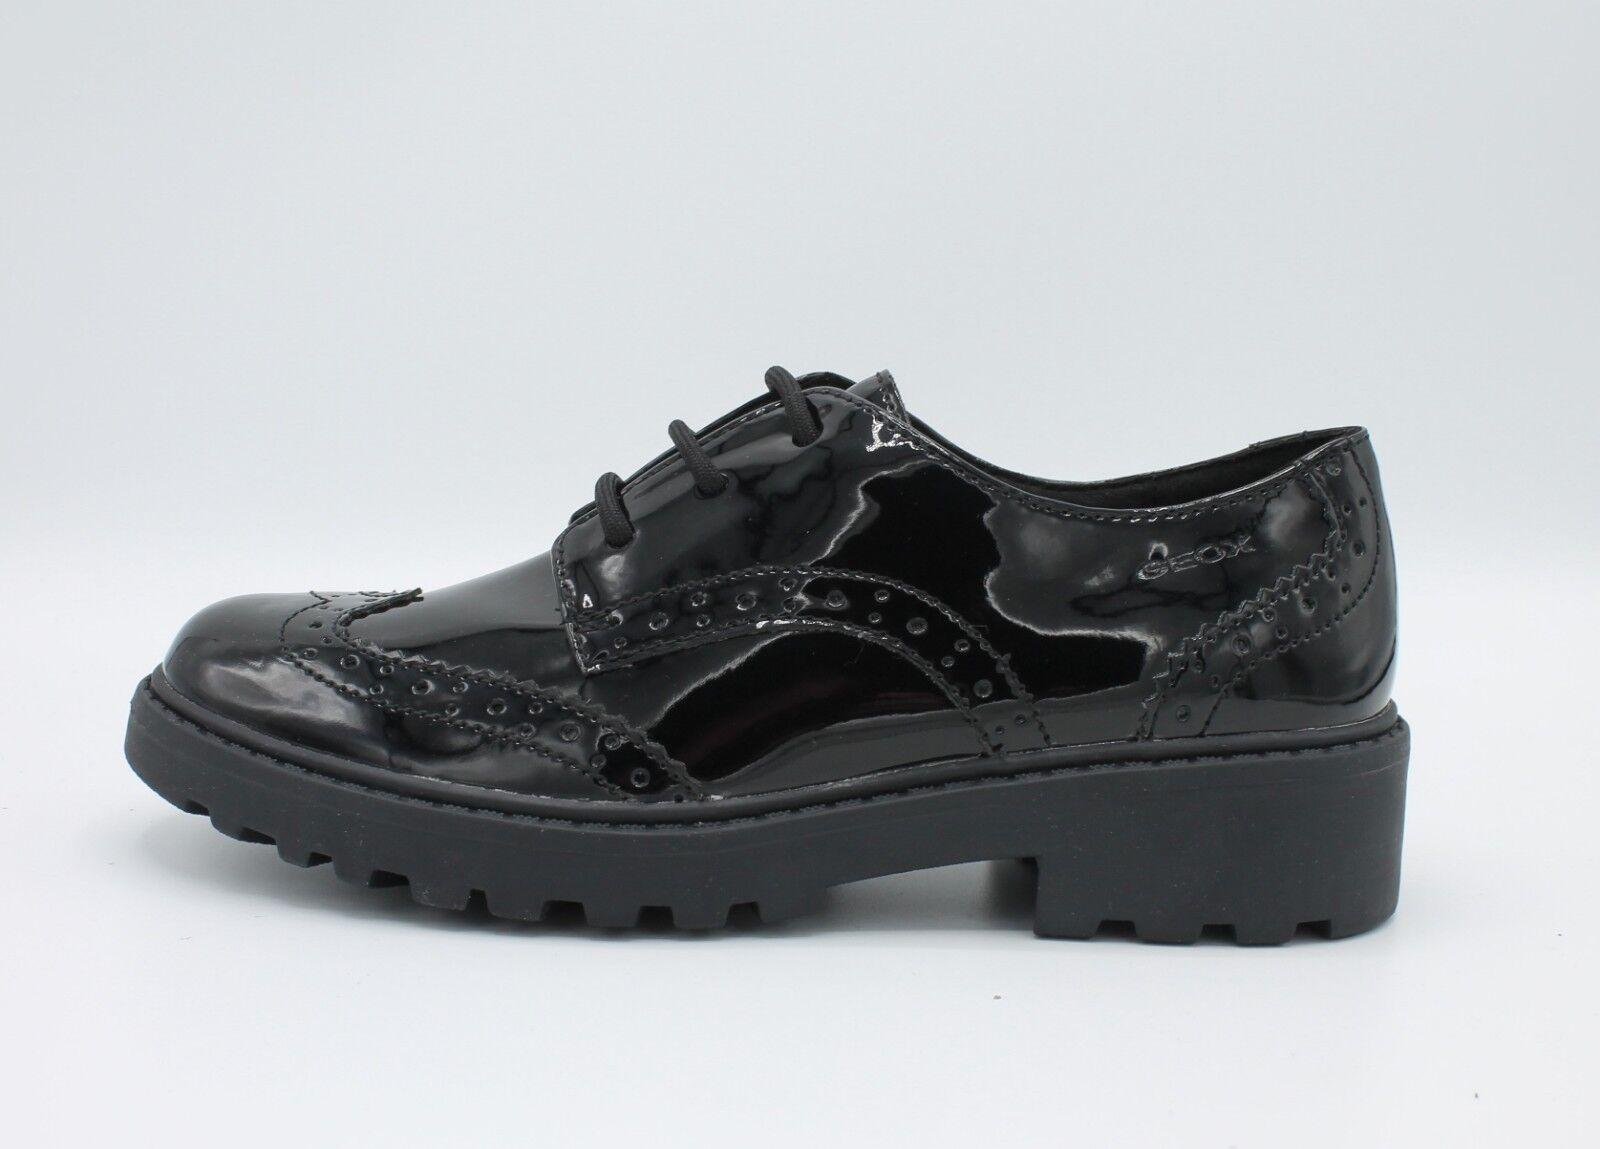 Geox zapatos negro da Bambina Francesine mujer in Vernice Pelle negro zapatos Derby Inglesine 21ae6b